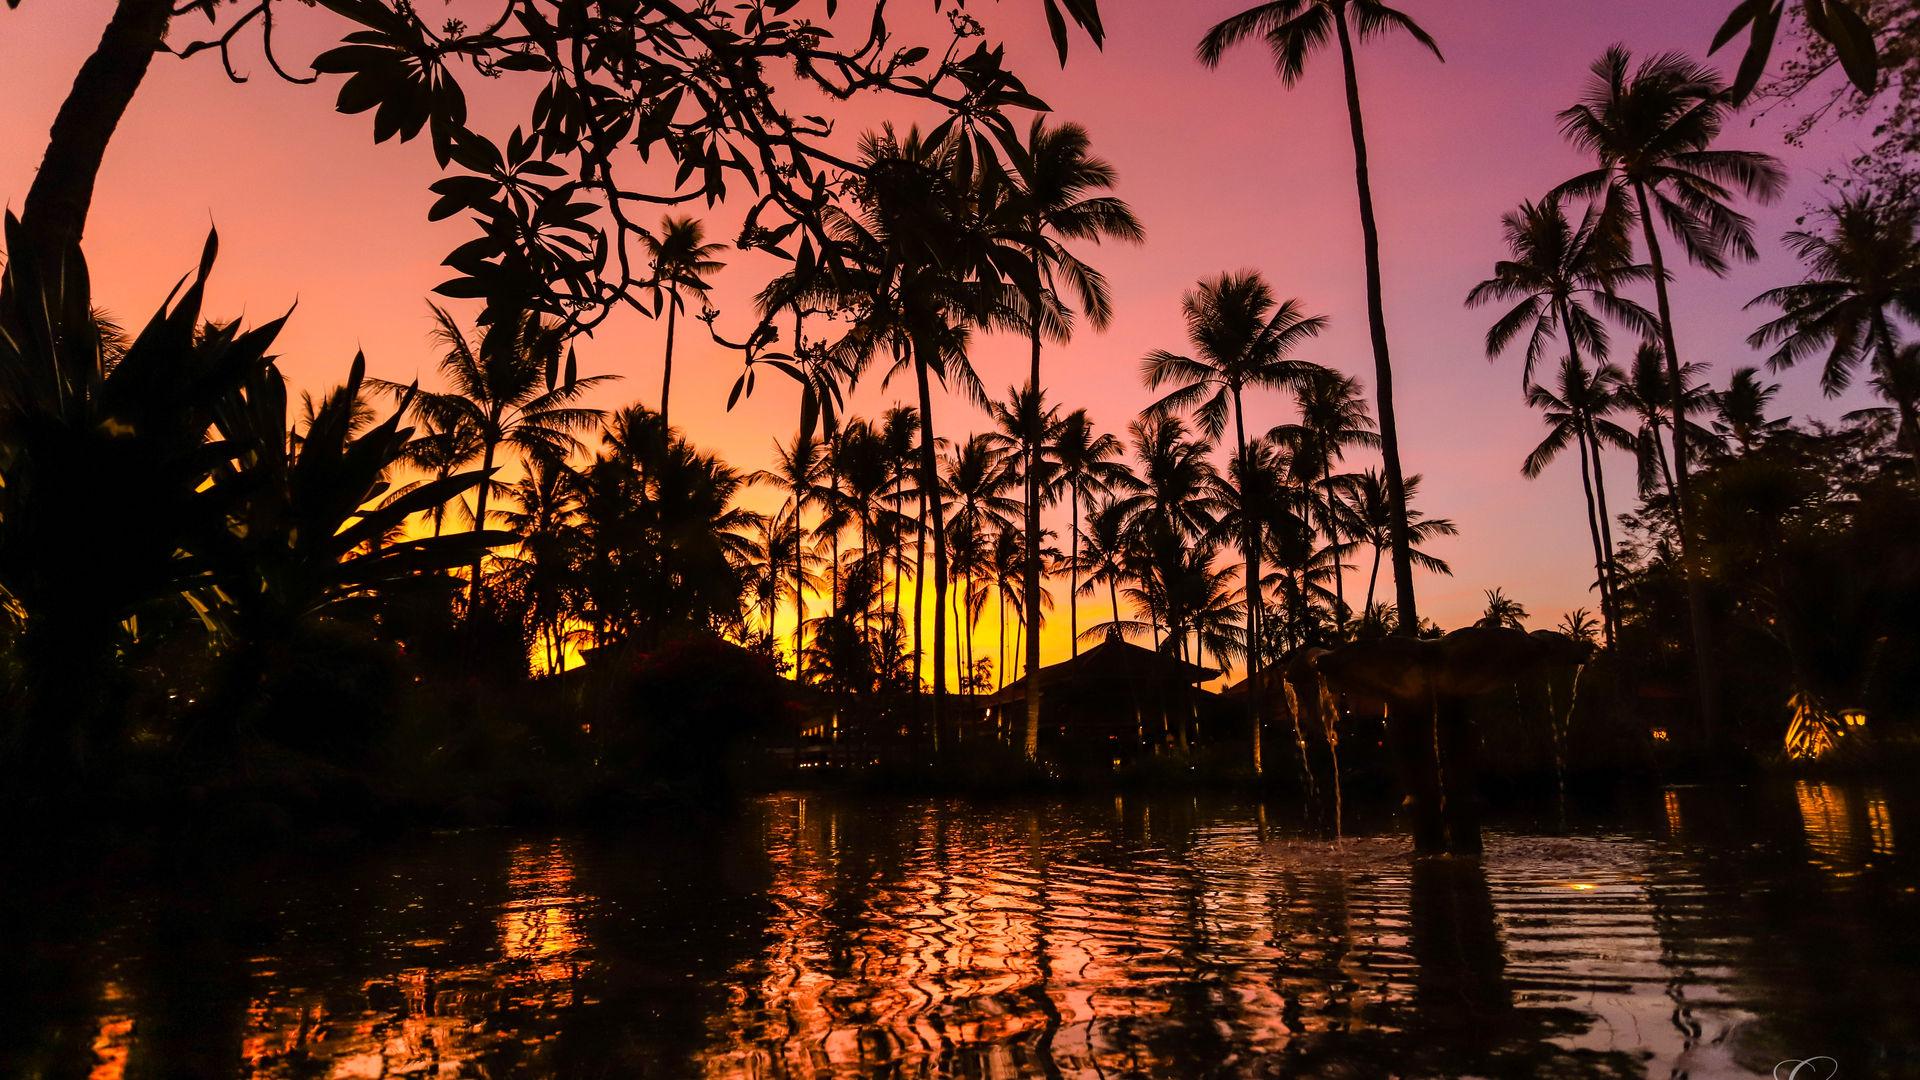 Bali Sunset Watermarked-1-3.jpg